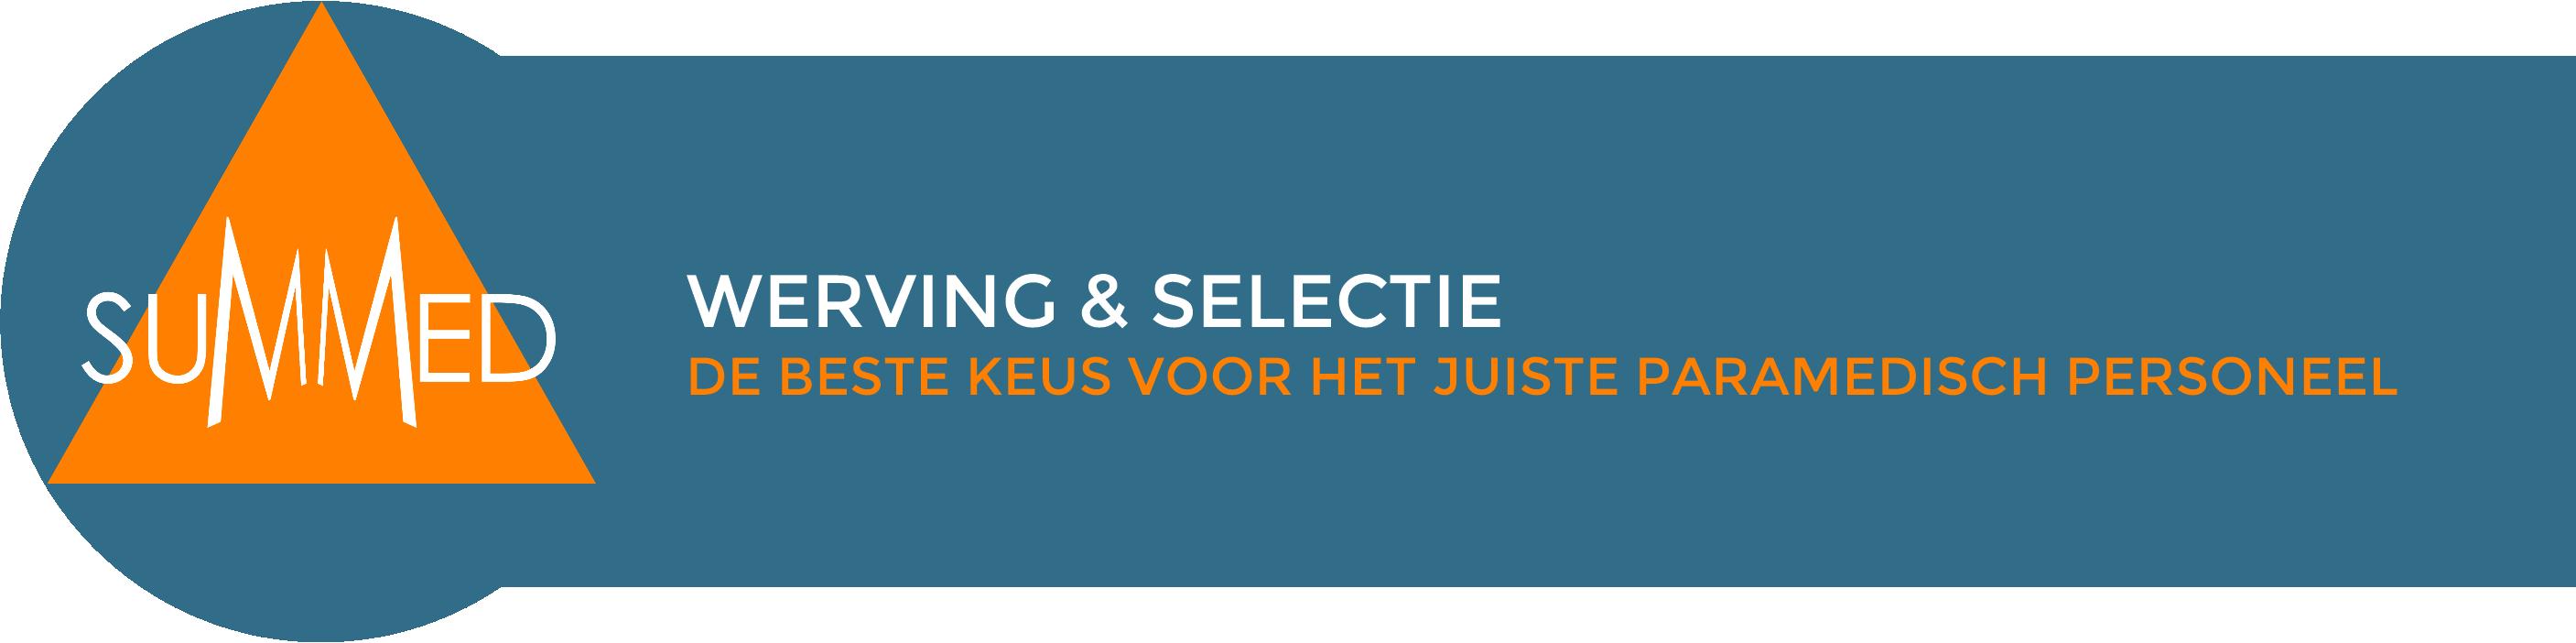 Bekkenfysiotherapeut Boekelo / Enschede